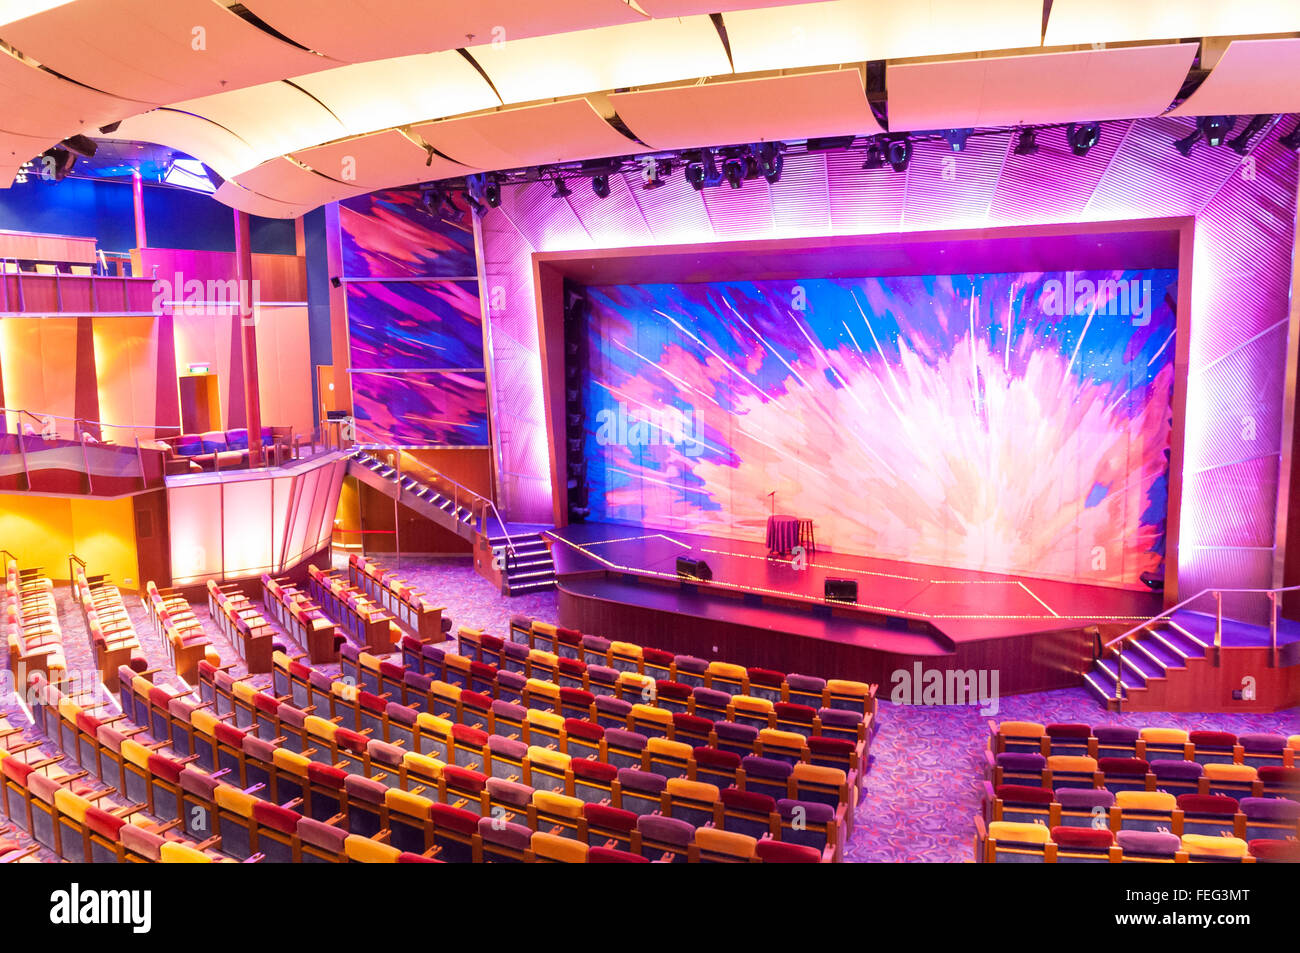 Interior of The Pacifica Theatre, Royal Caribbean's Brilliance of the Seas cruise ship, North Sea, Europe - Stock Image